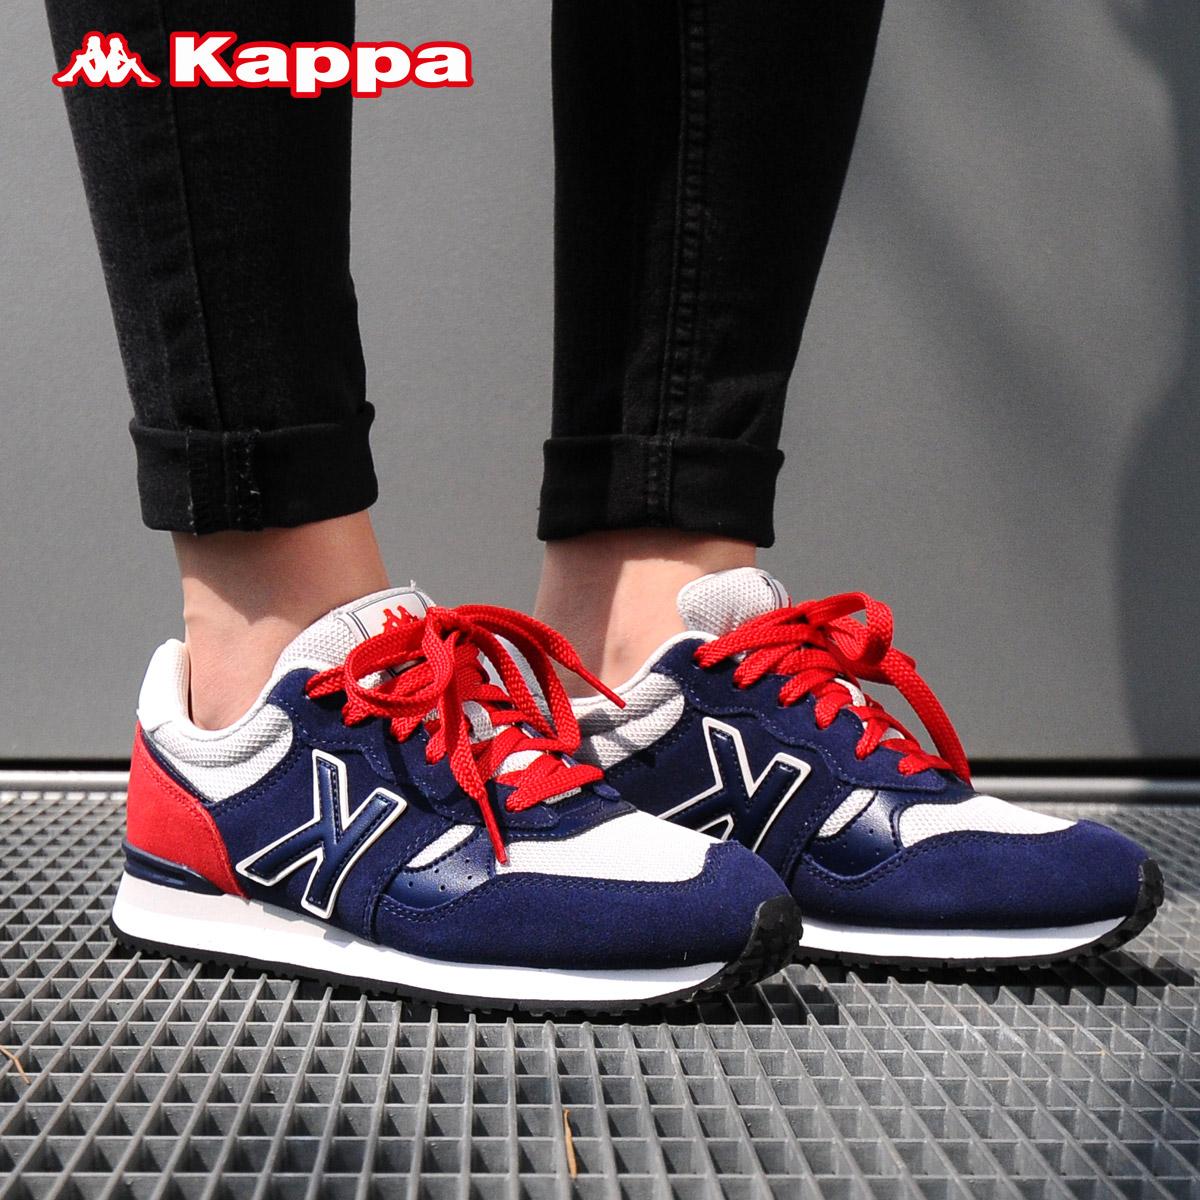 Kappa卡帕 情侶男女運動鞋休閒鞋復古跑步鞋網鞋 K0665MM51D